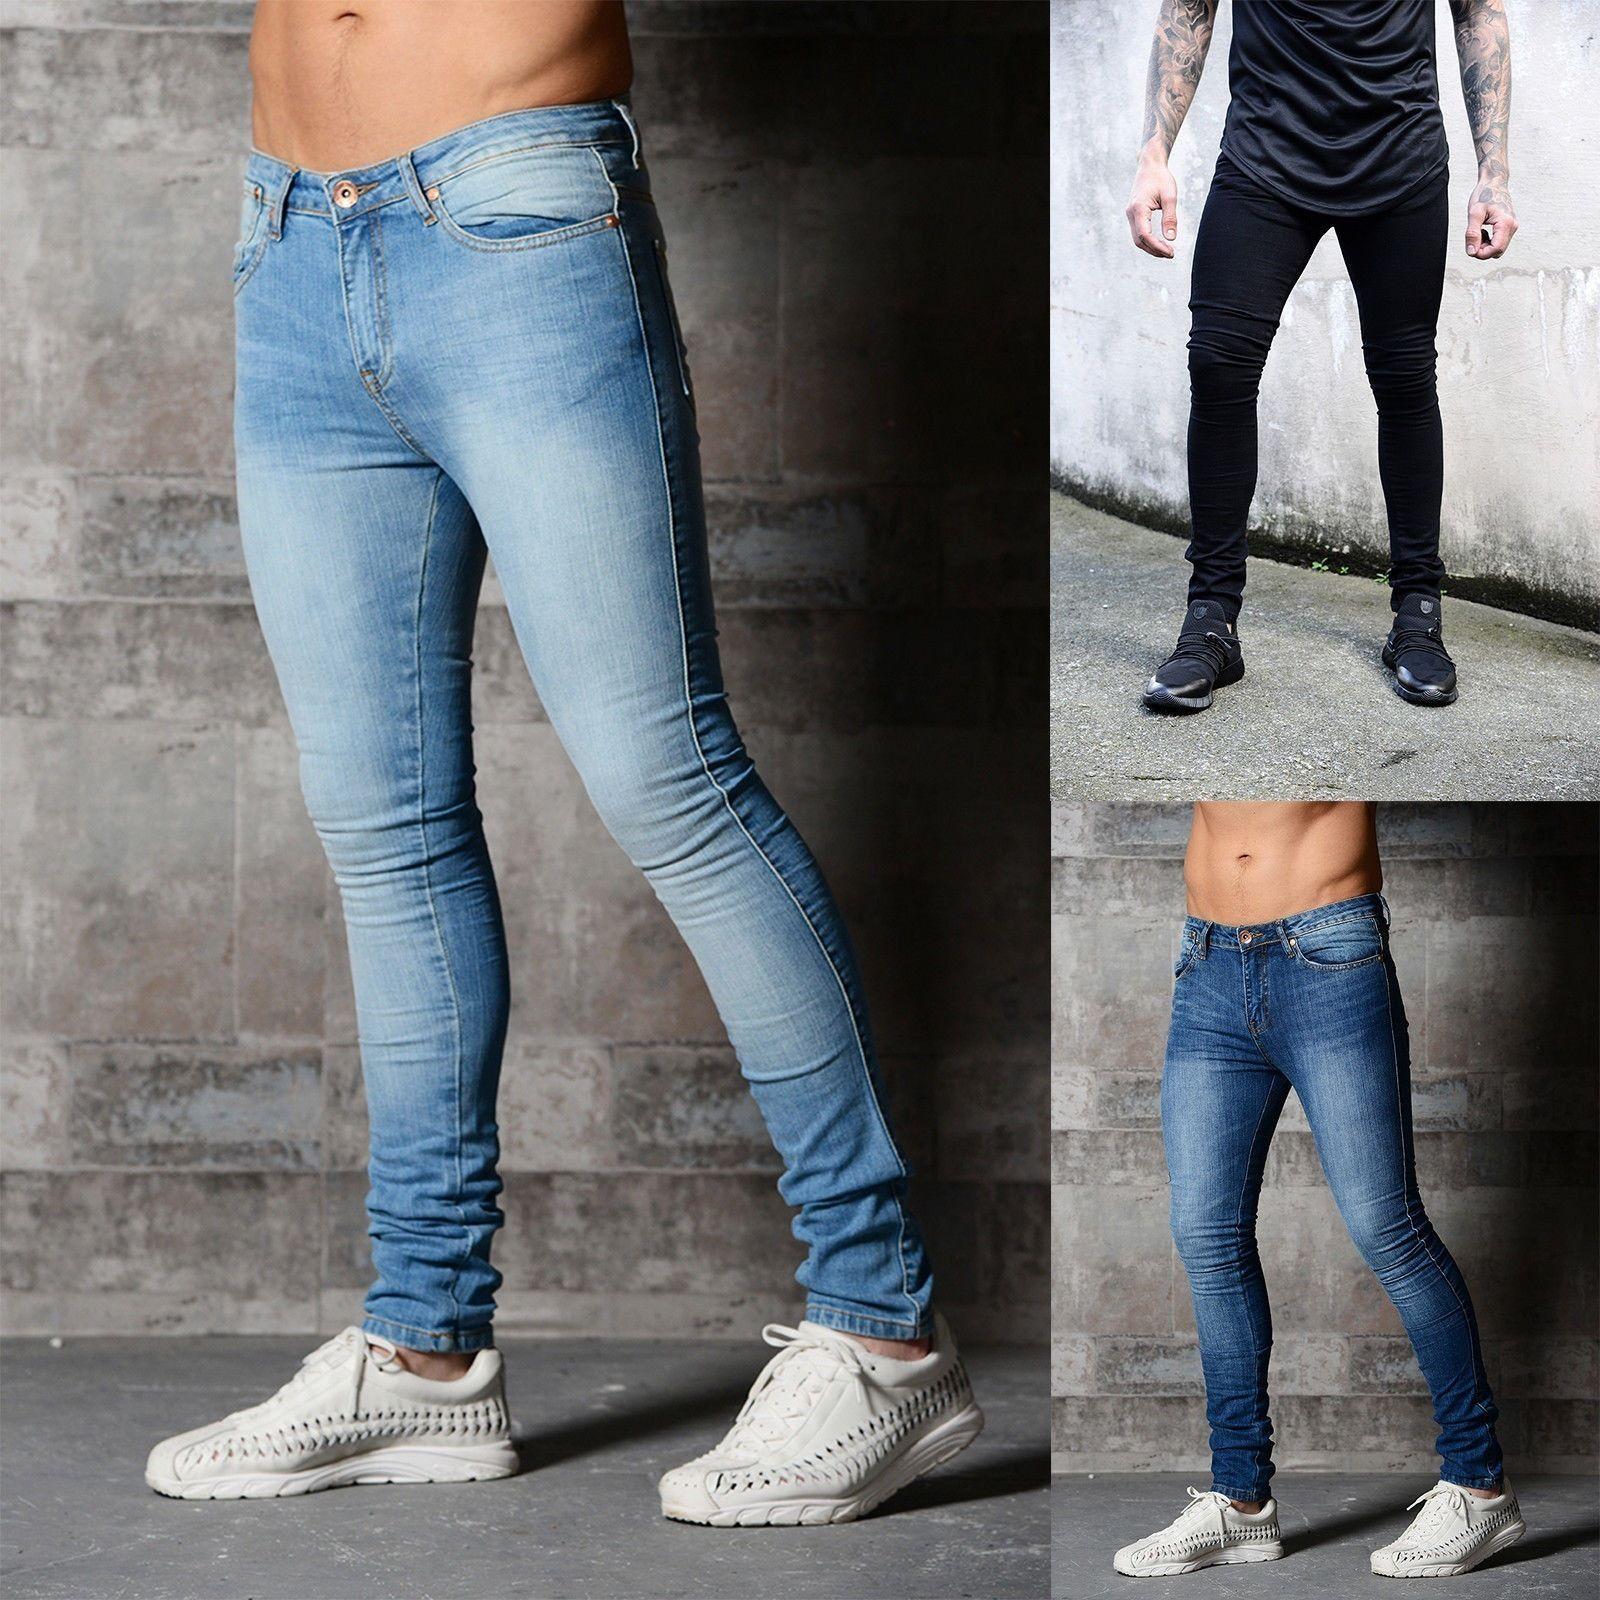 Feet Ebay Bound Pop2019 Fermer Cowboy European Amazon Wish Pantalon Unie Man Couleur mN8y0vOnw